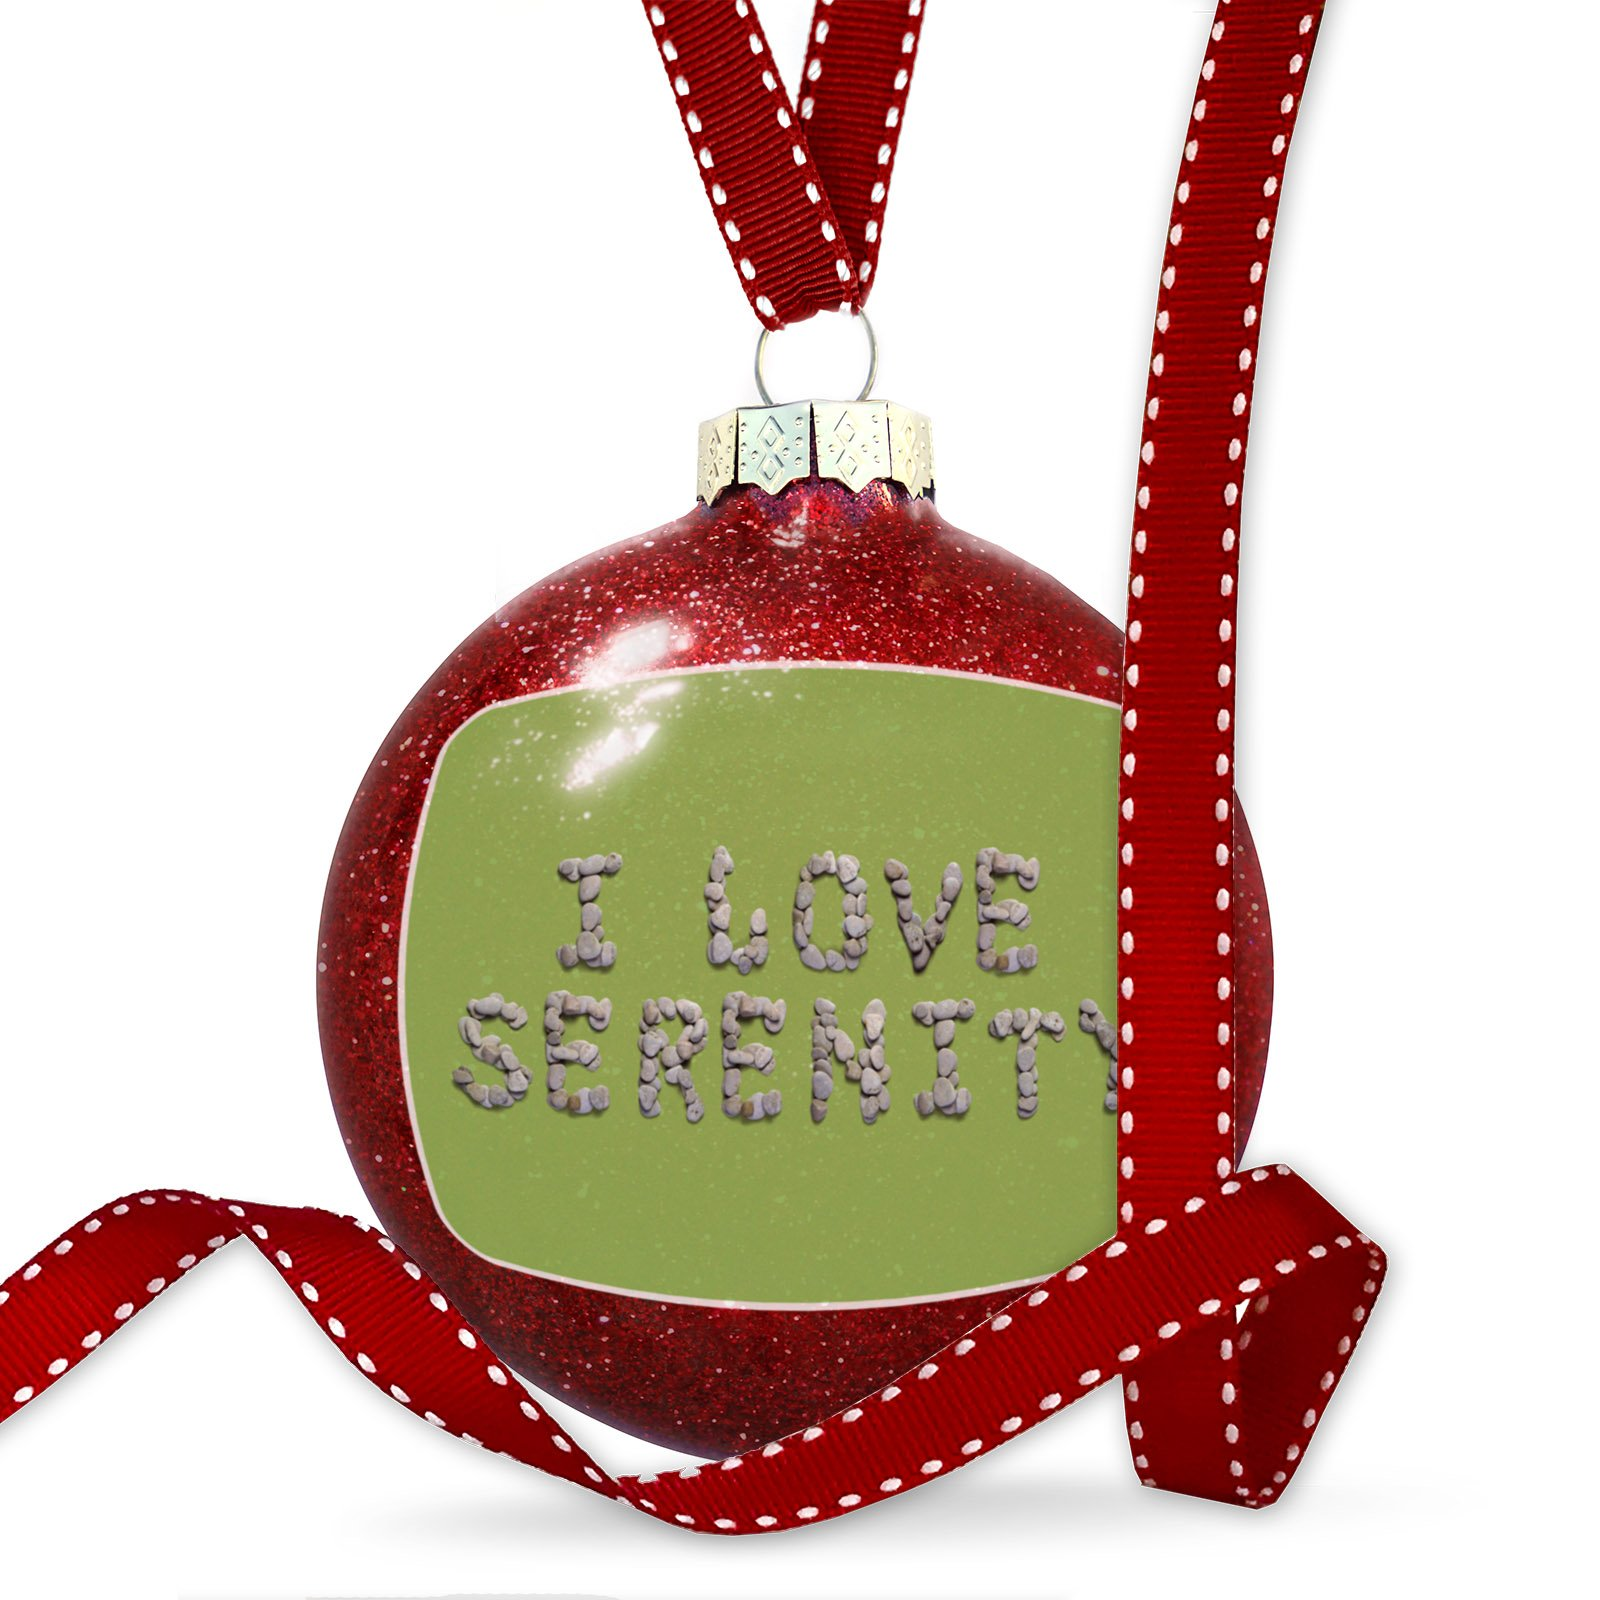 Christmas Decoration I Love Serenity Spa Stones Rocks Ornament